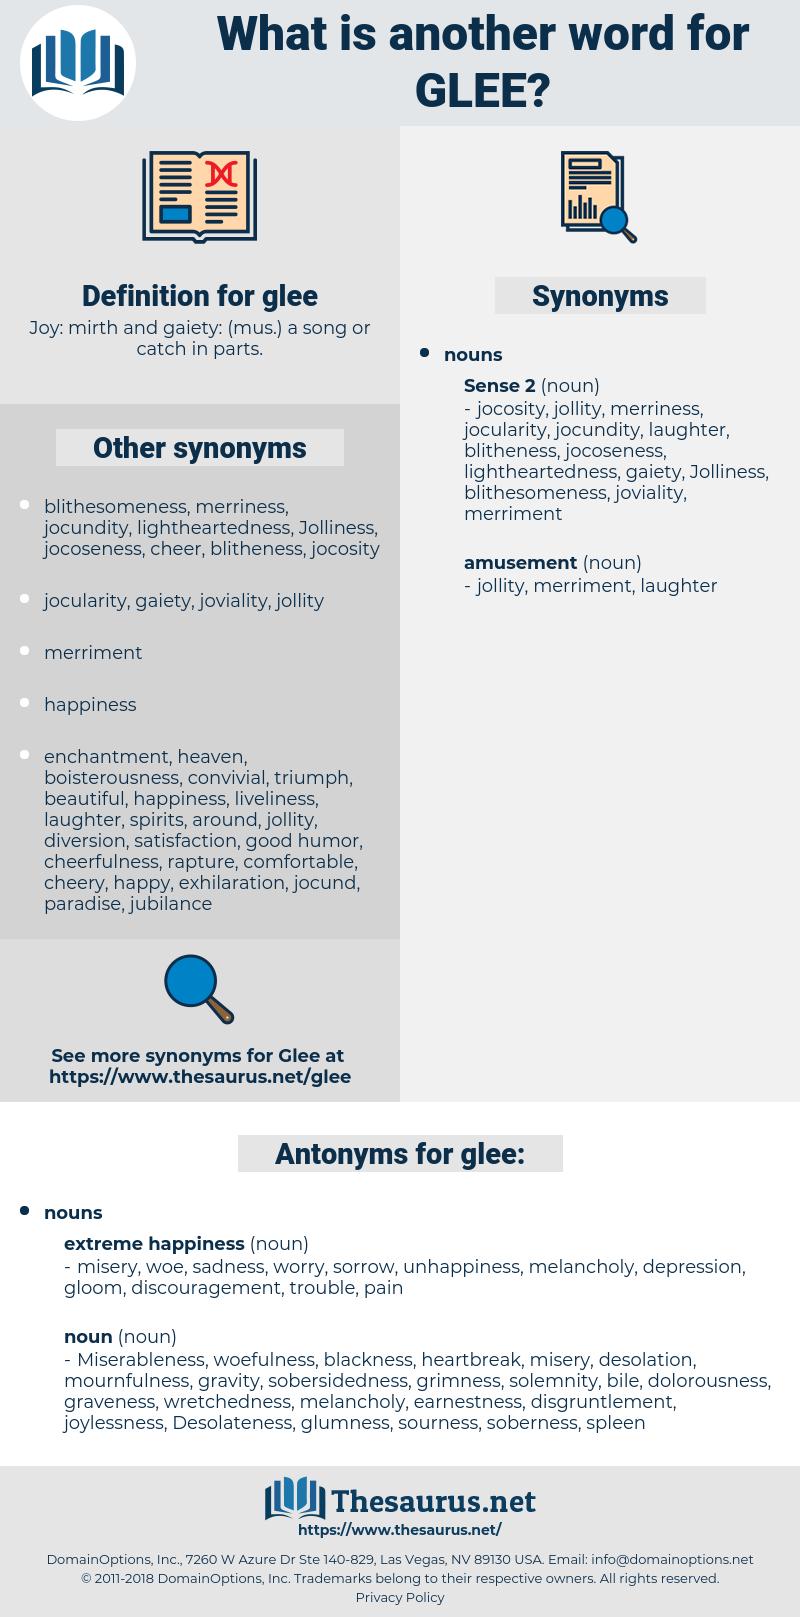 glee, synonym glee, another word for glee, words like glee, thesaurus glee